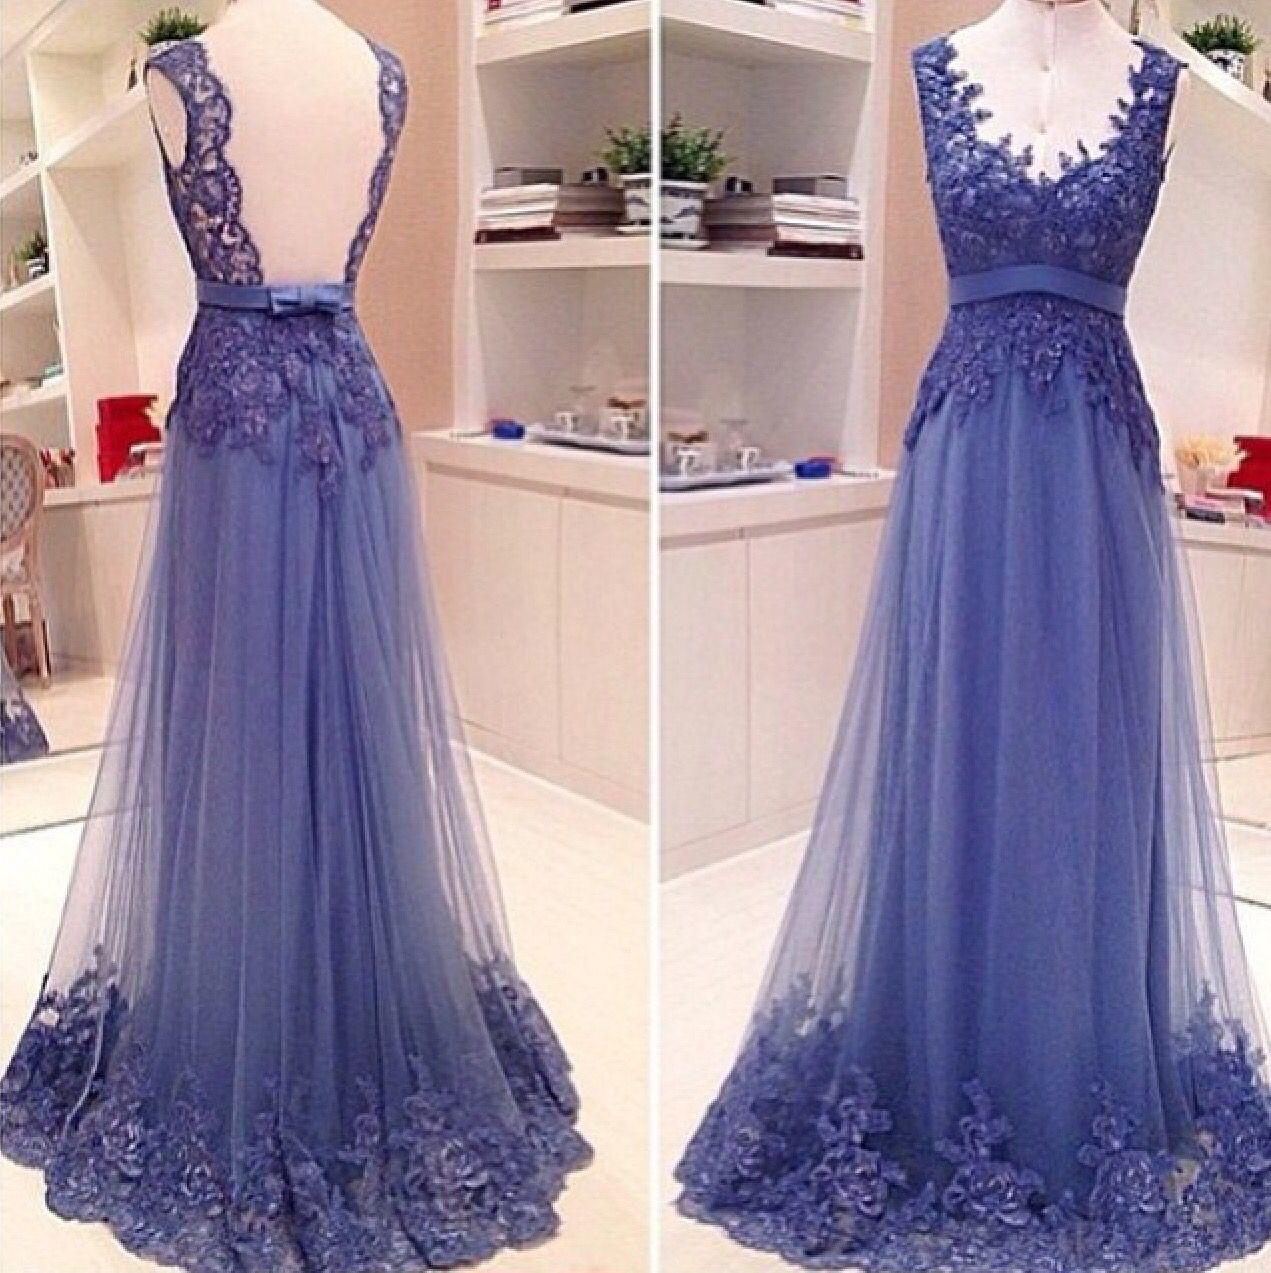 Bridesmaid dress goals   Amazing Dresses   Pinterest   Goal, Prom ...